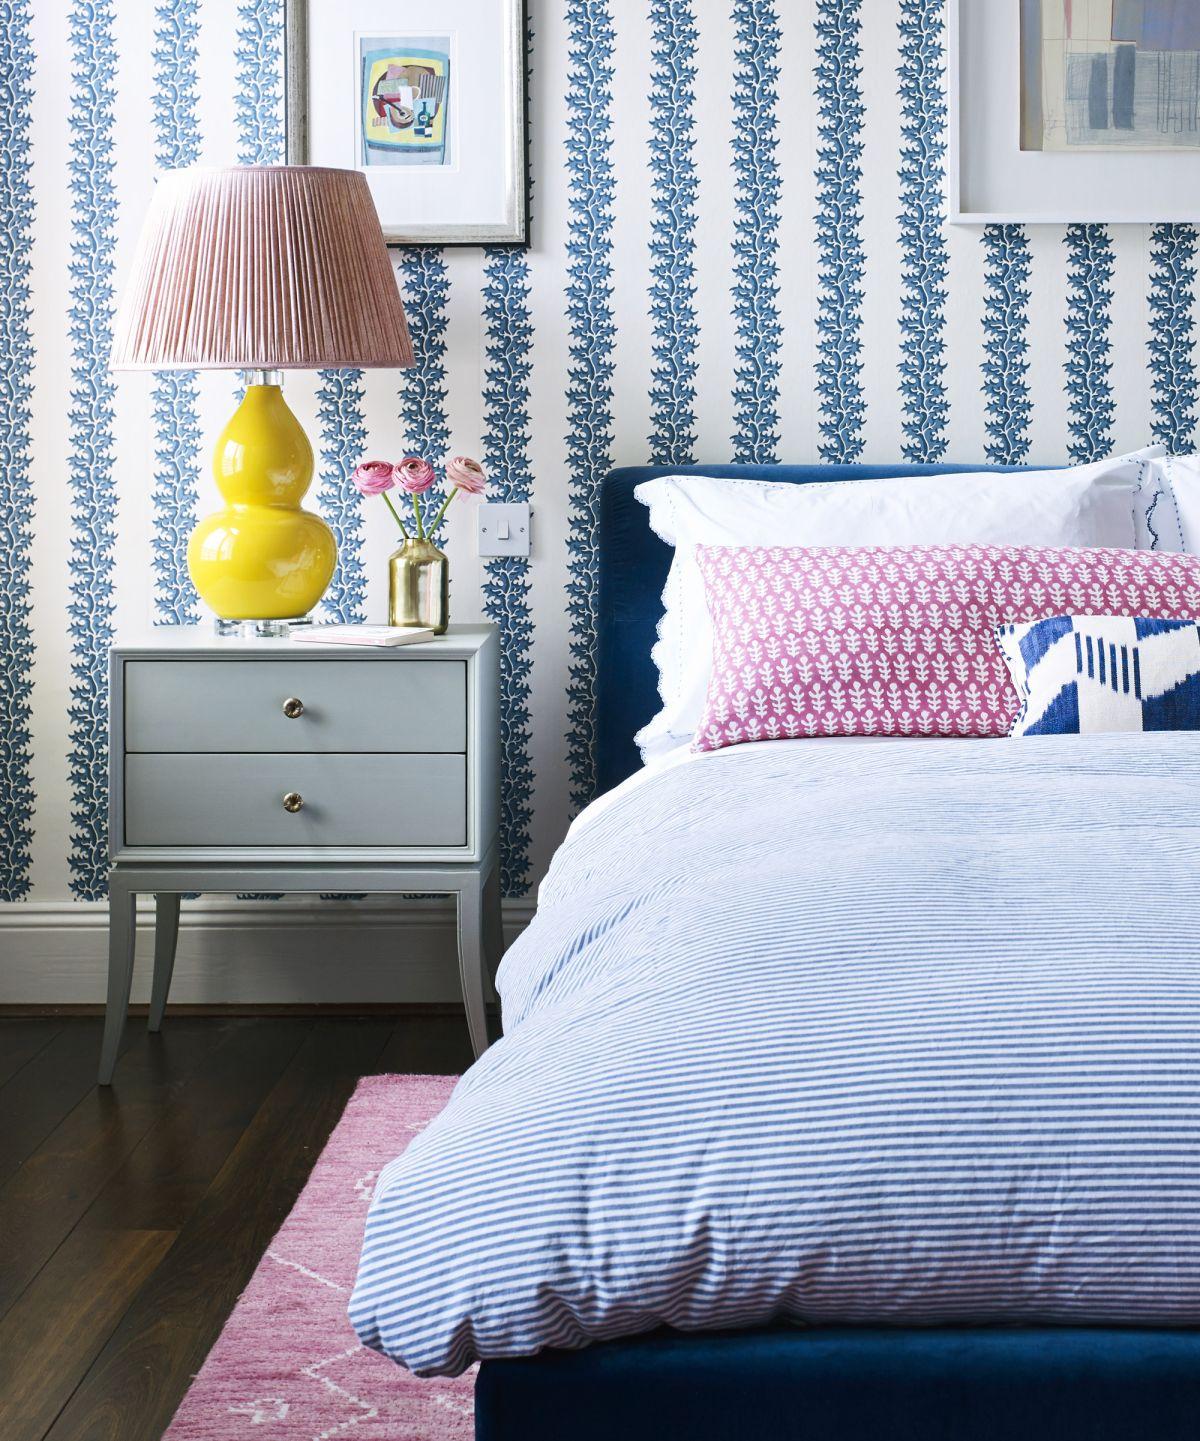 10 top pillows to help you sleep better